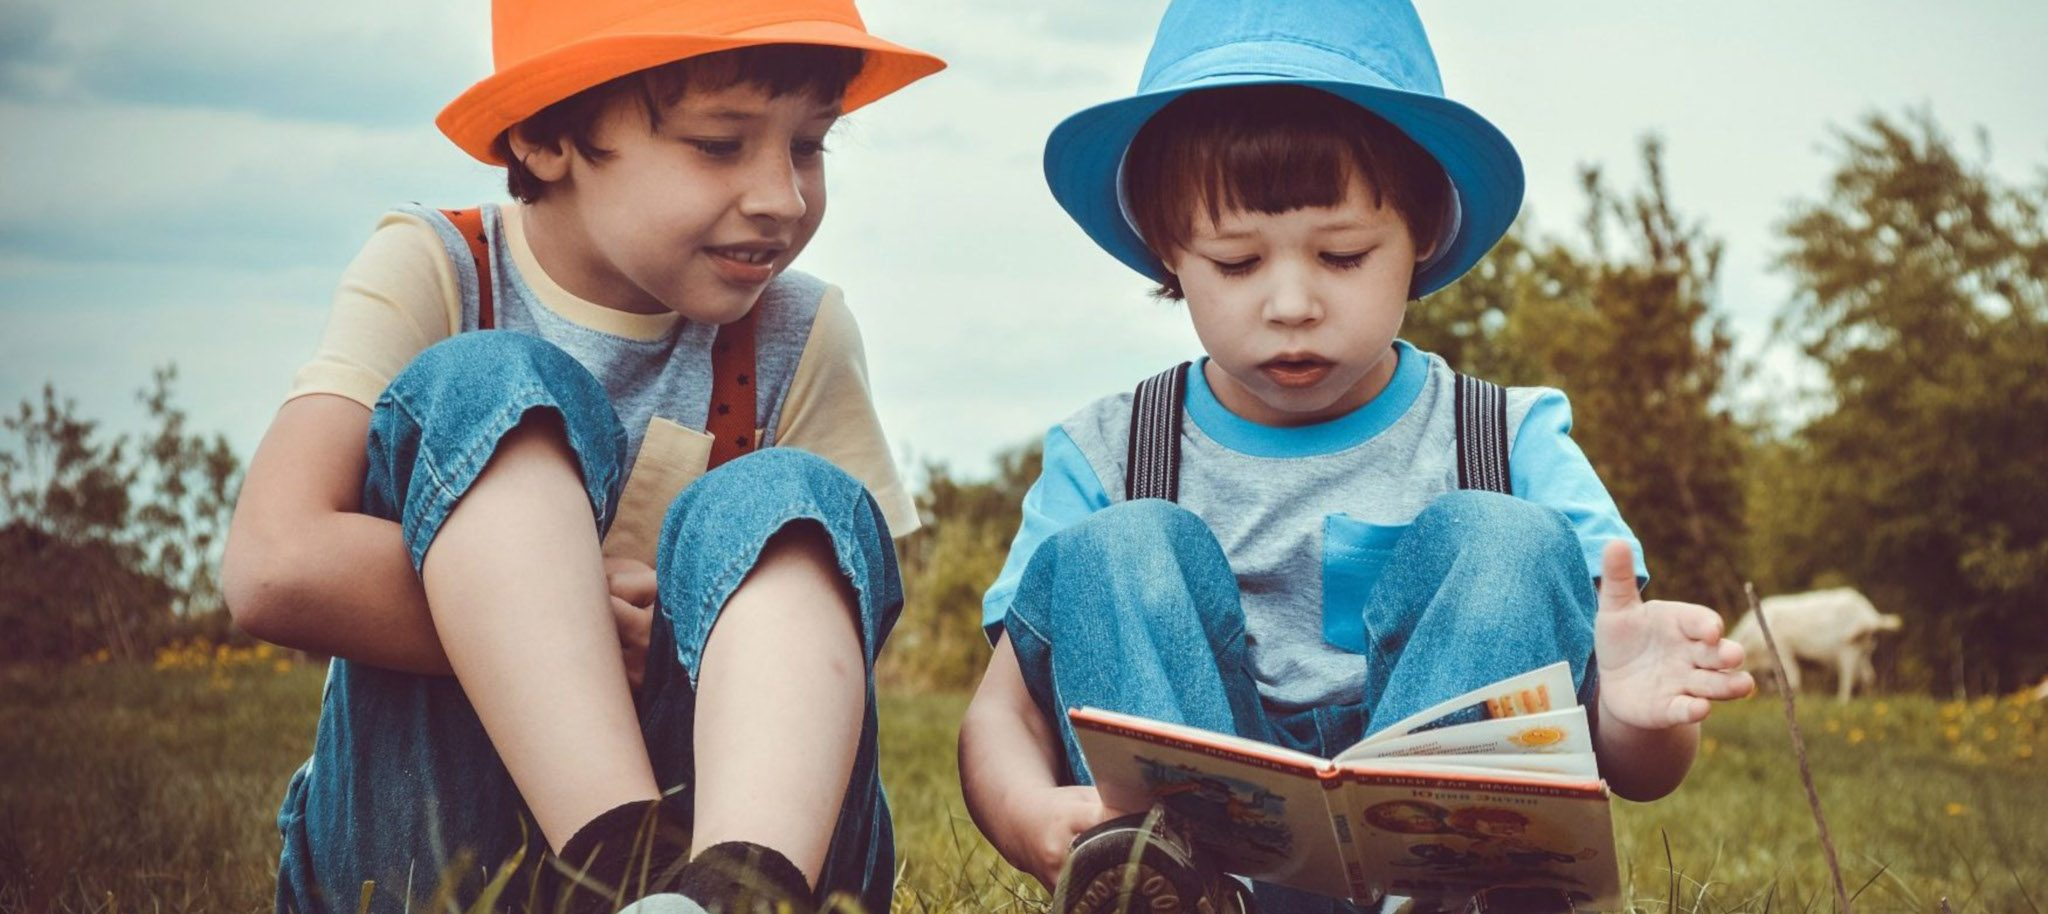 nappr-kids-reading-e1543856910770